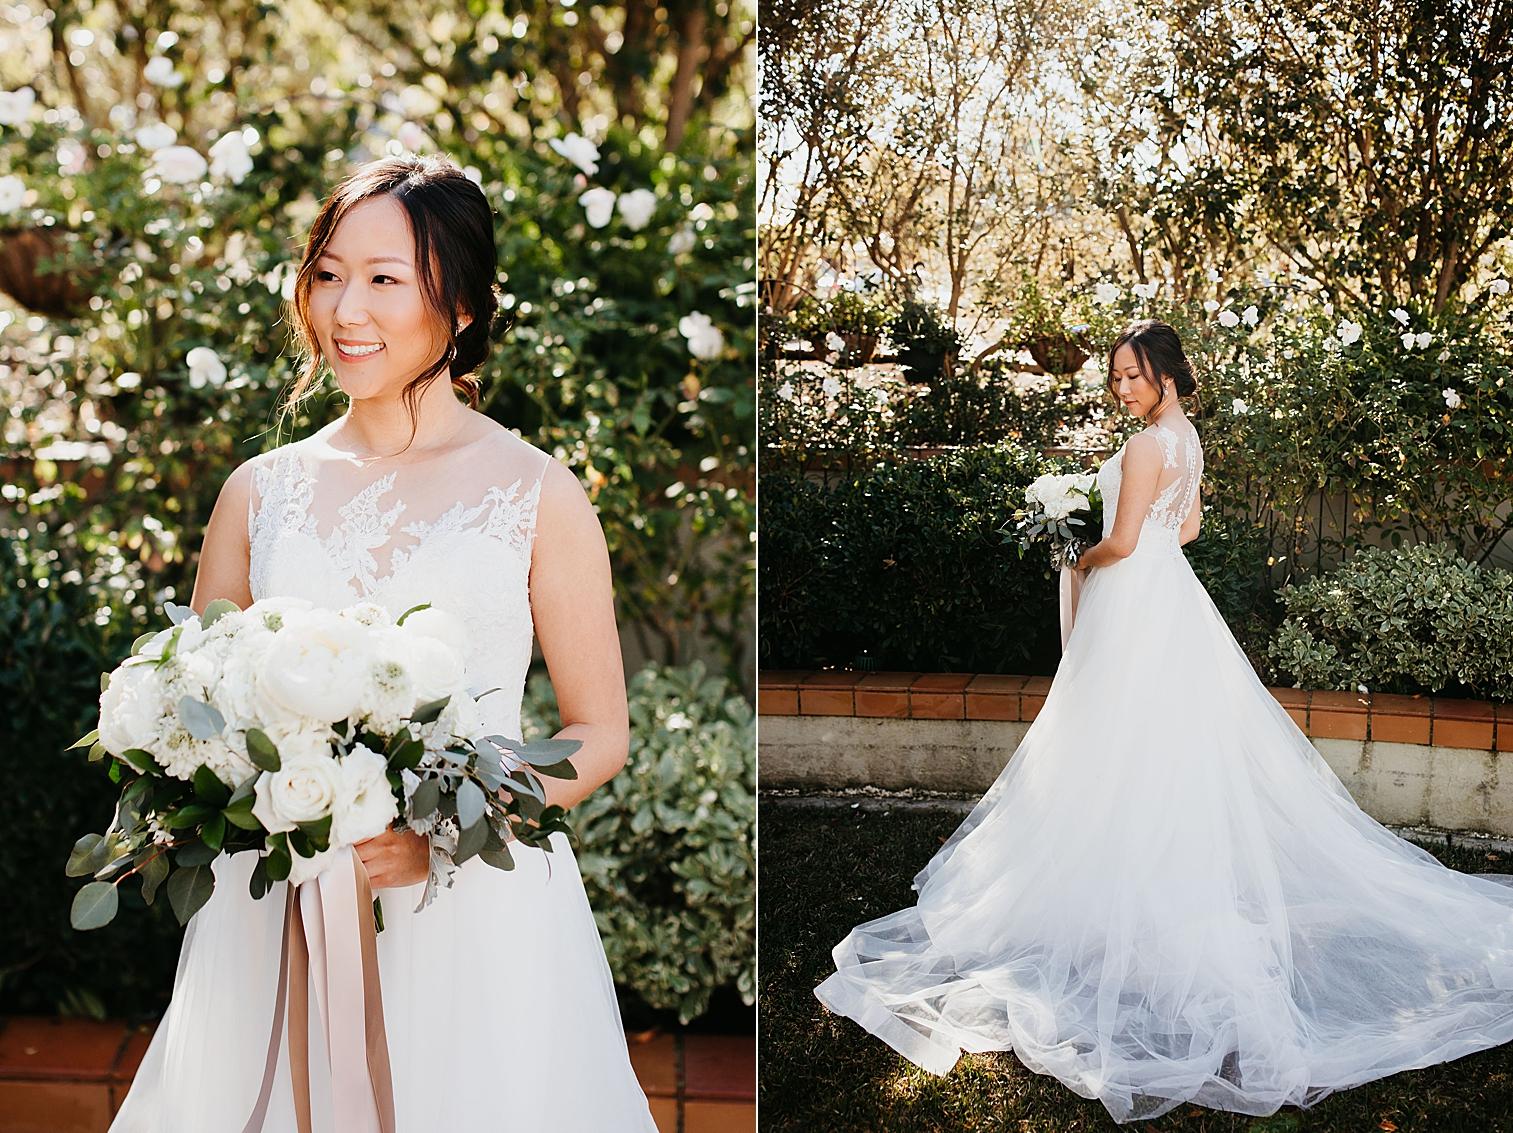 Secret-Garden-Rancho-Santa-Fe-Wedding-32.jpg